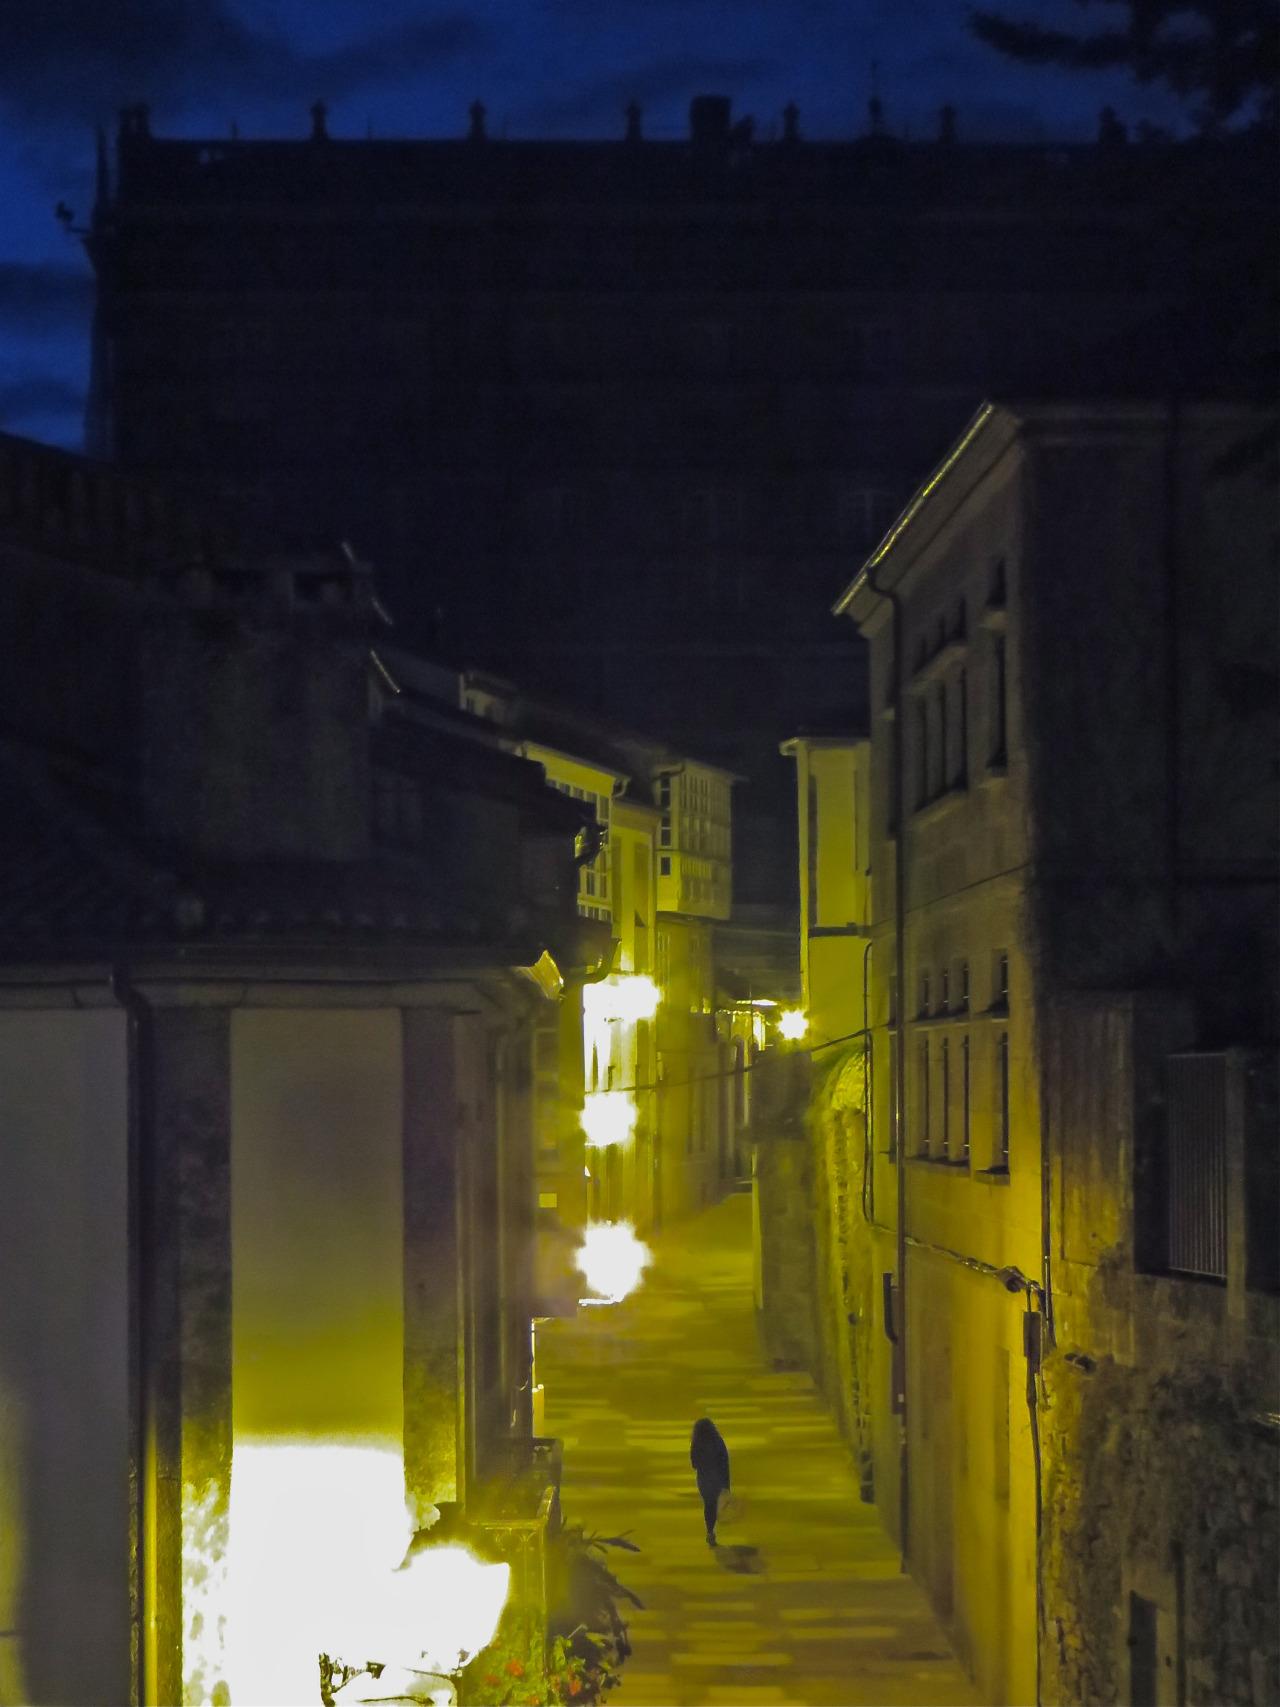 Noćne fotografije... - Page 4 Tumblr_nbdxse3omS1sjp4tmo1_1280